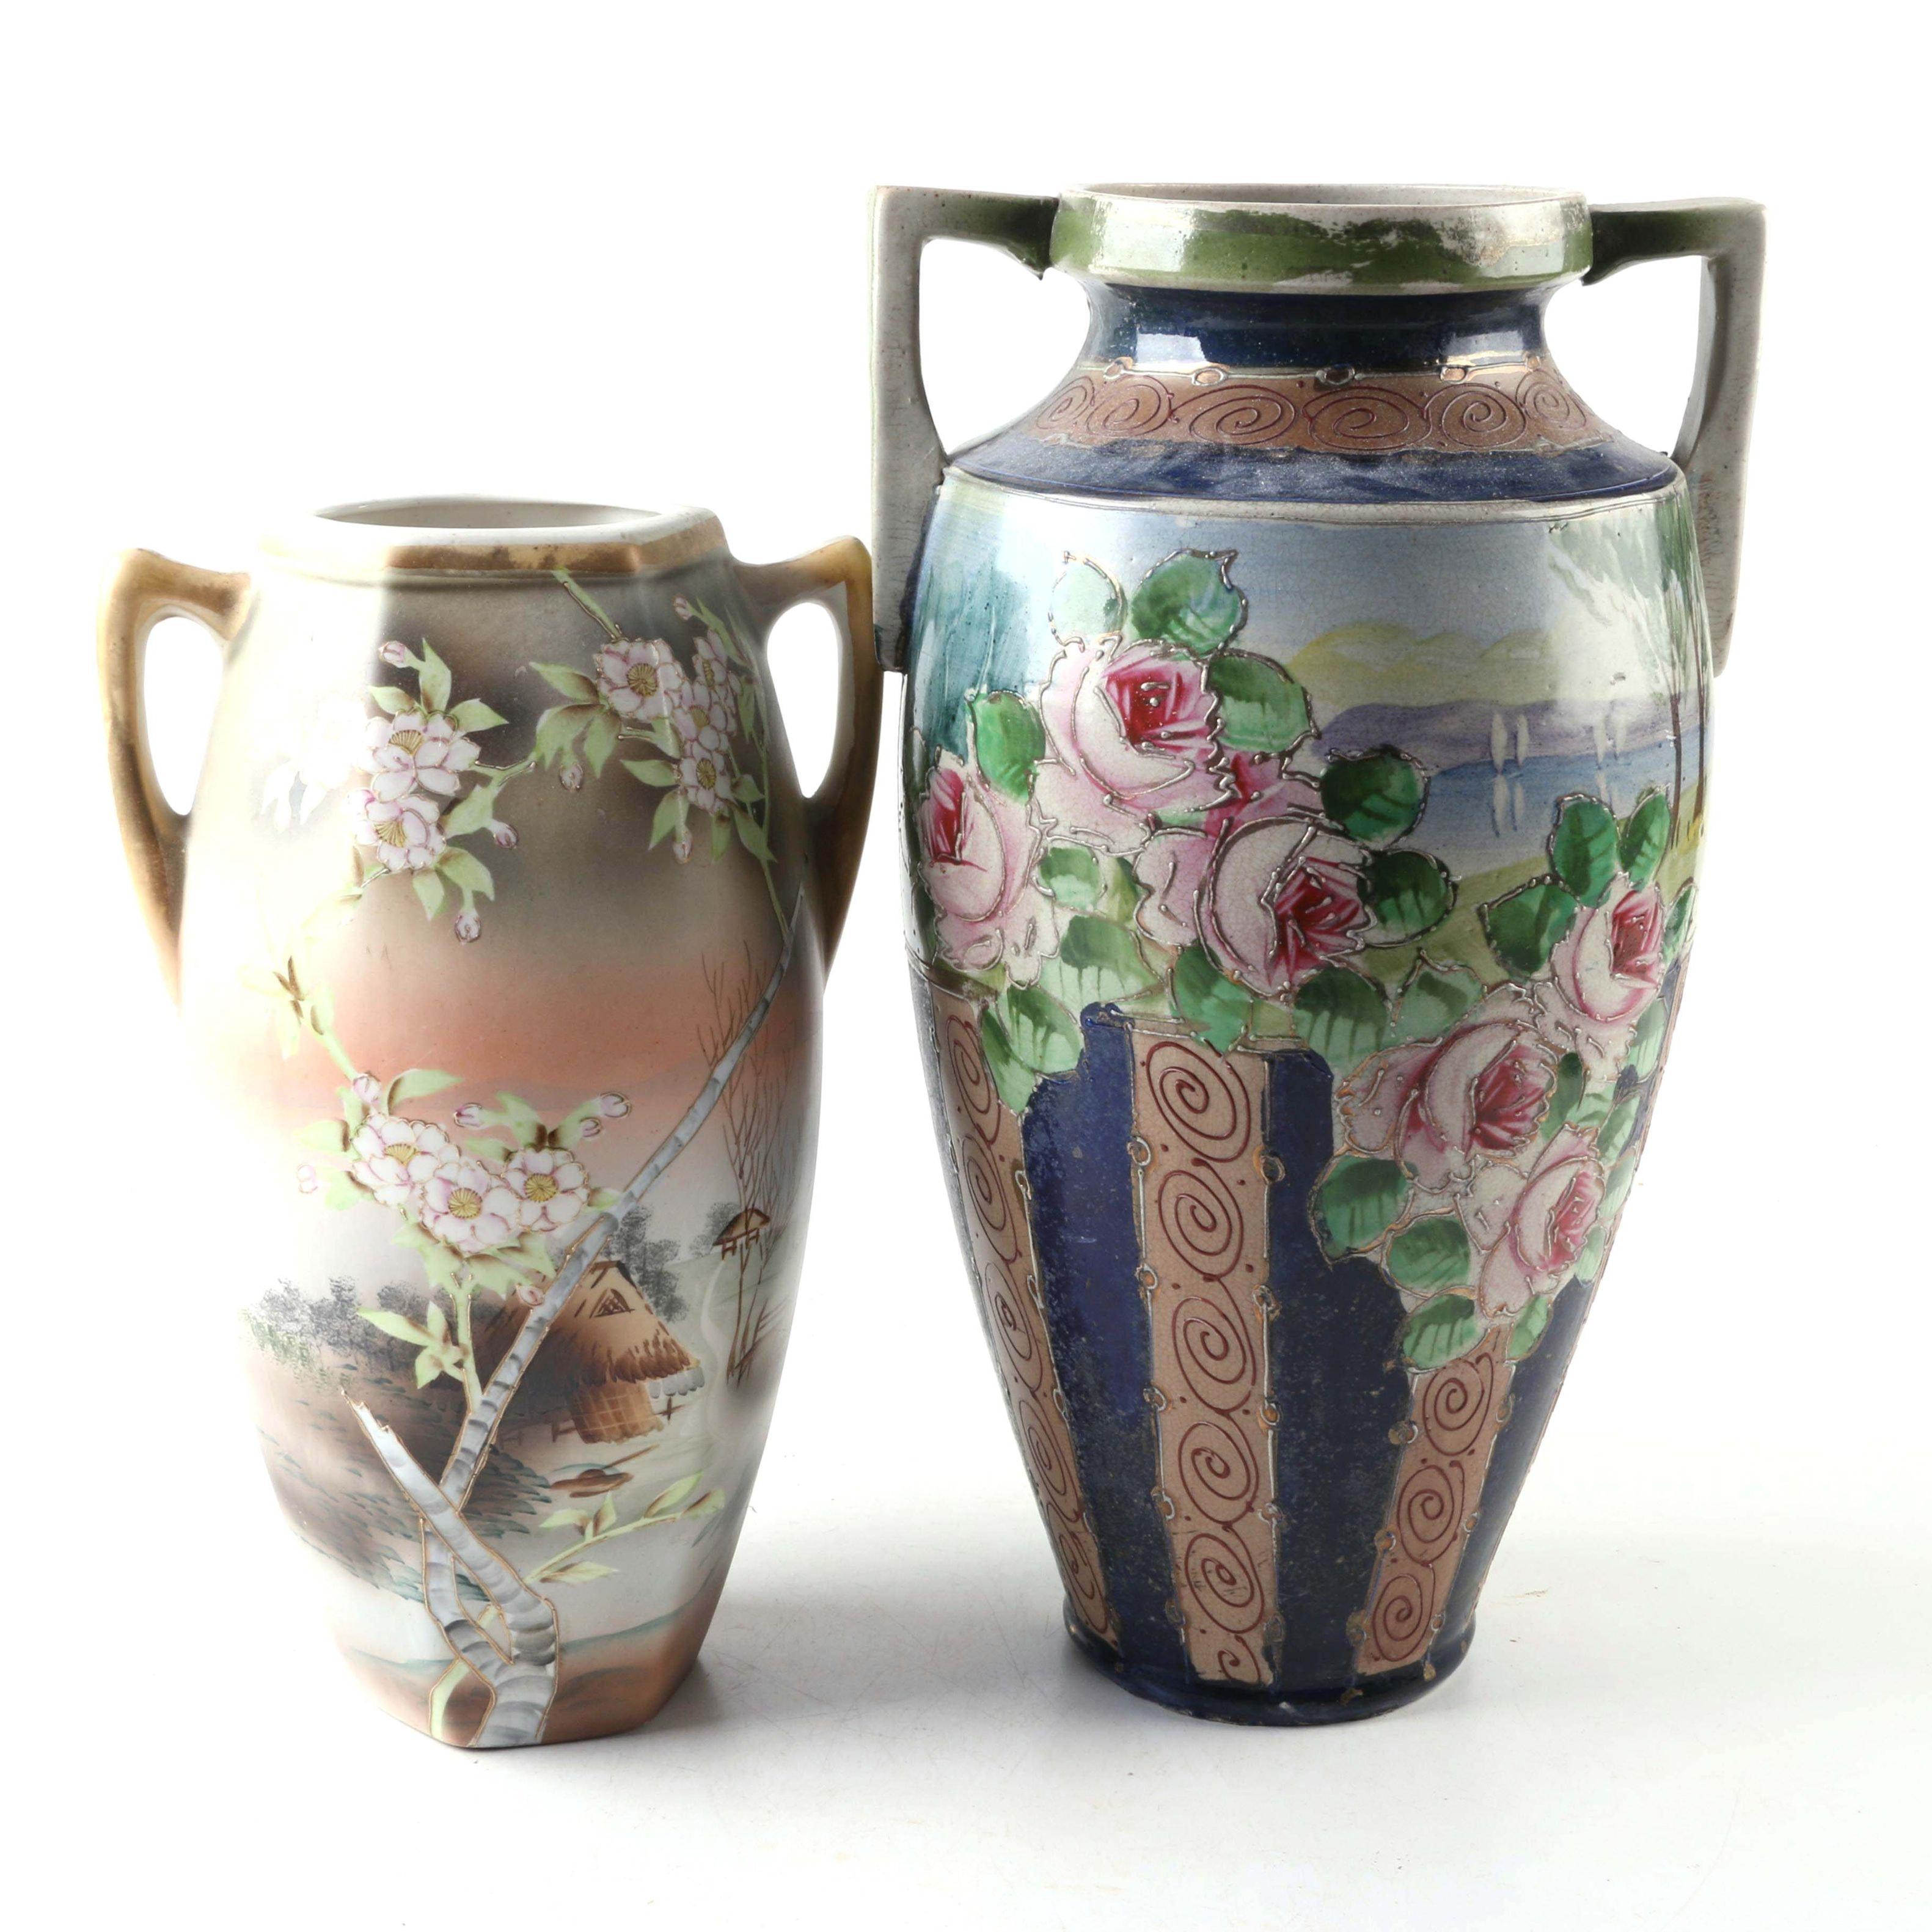 Vintage Japanese Nippon Hand-Painted Ceramic Vases